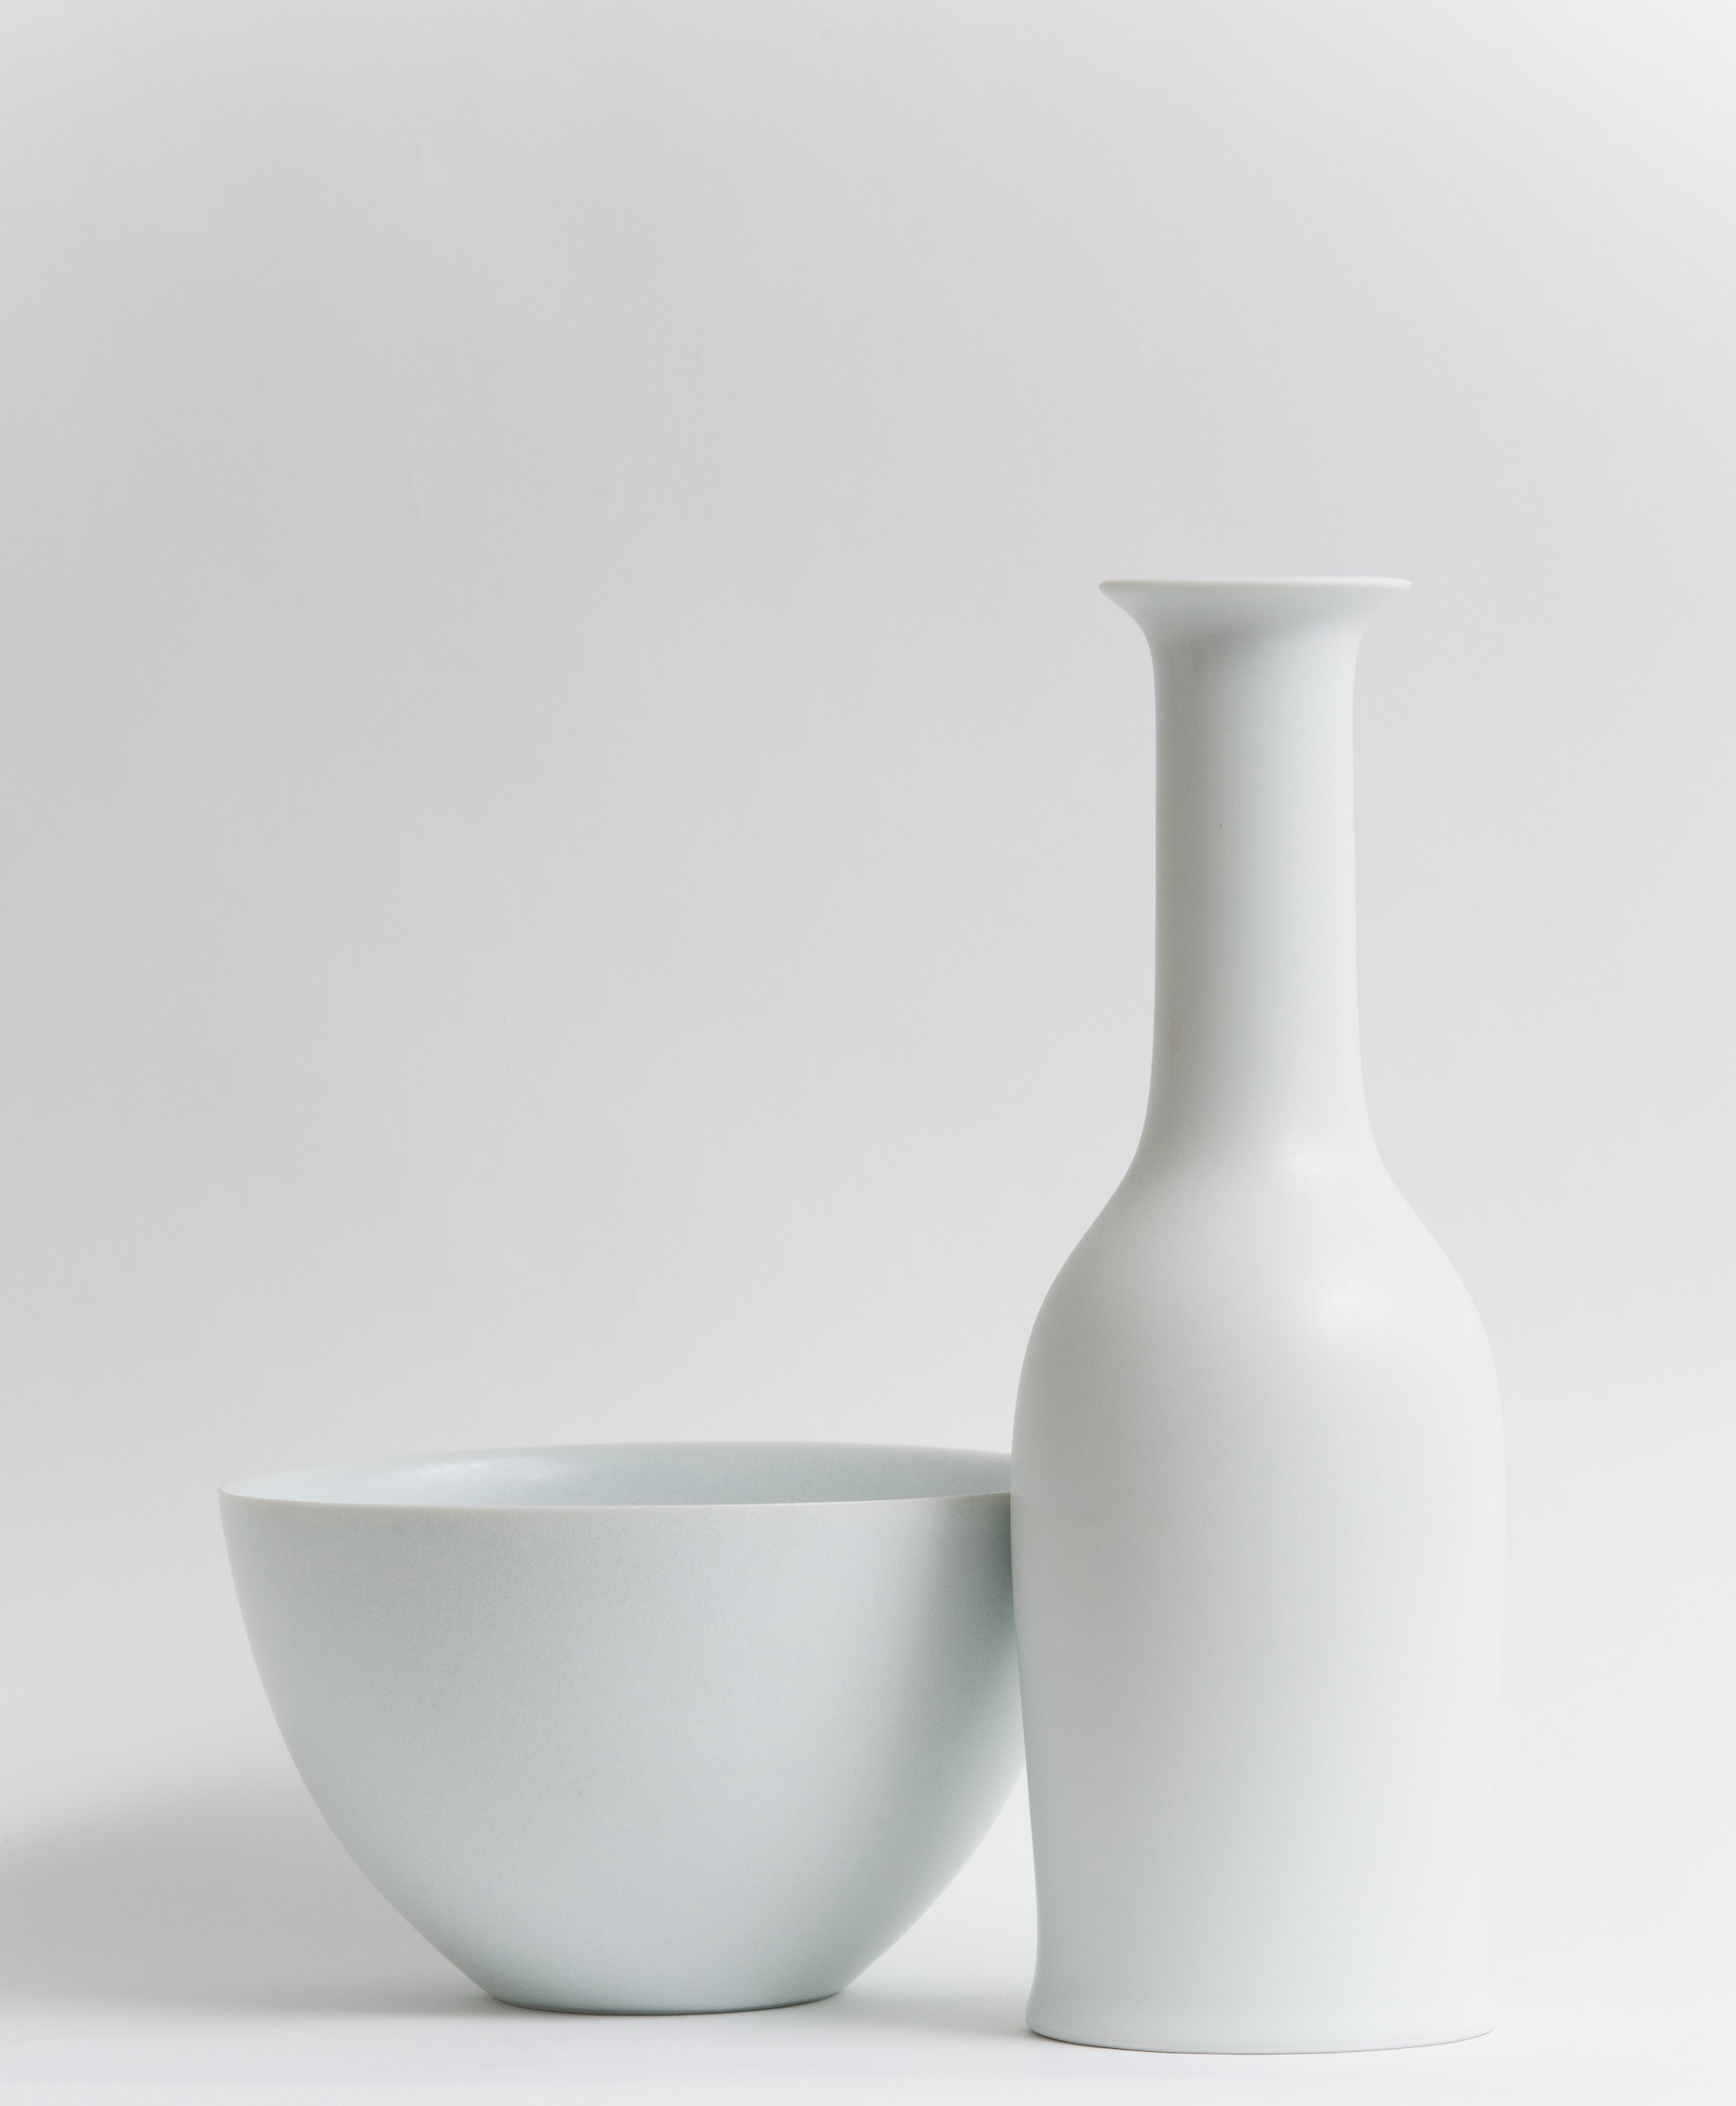 18 Vase and Bowl 2011.jpg